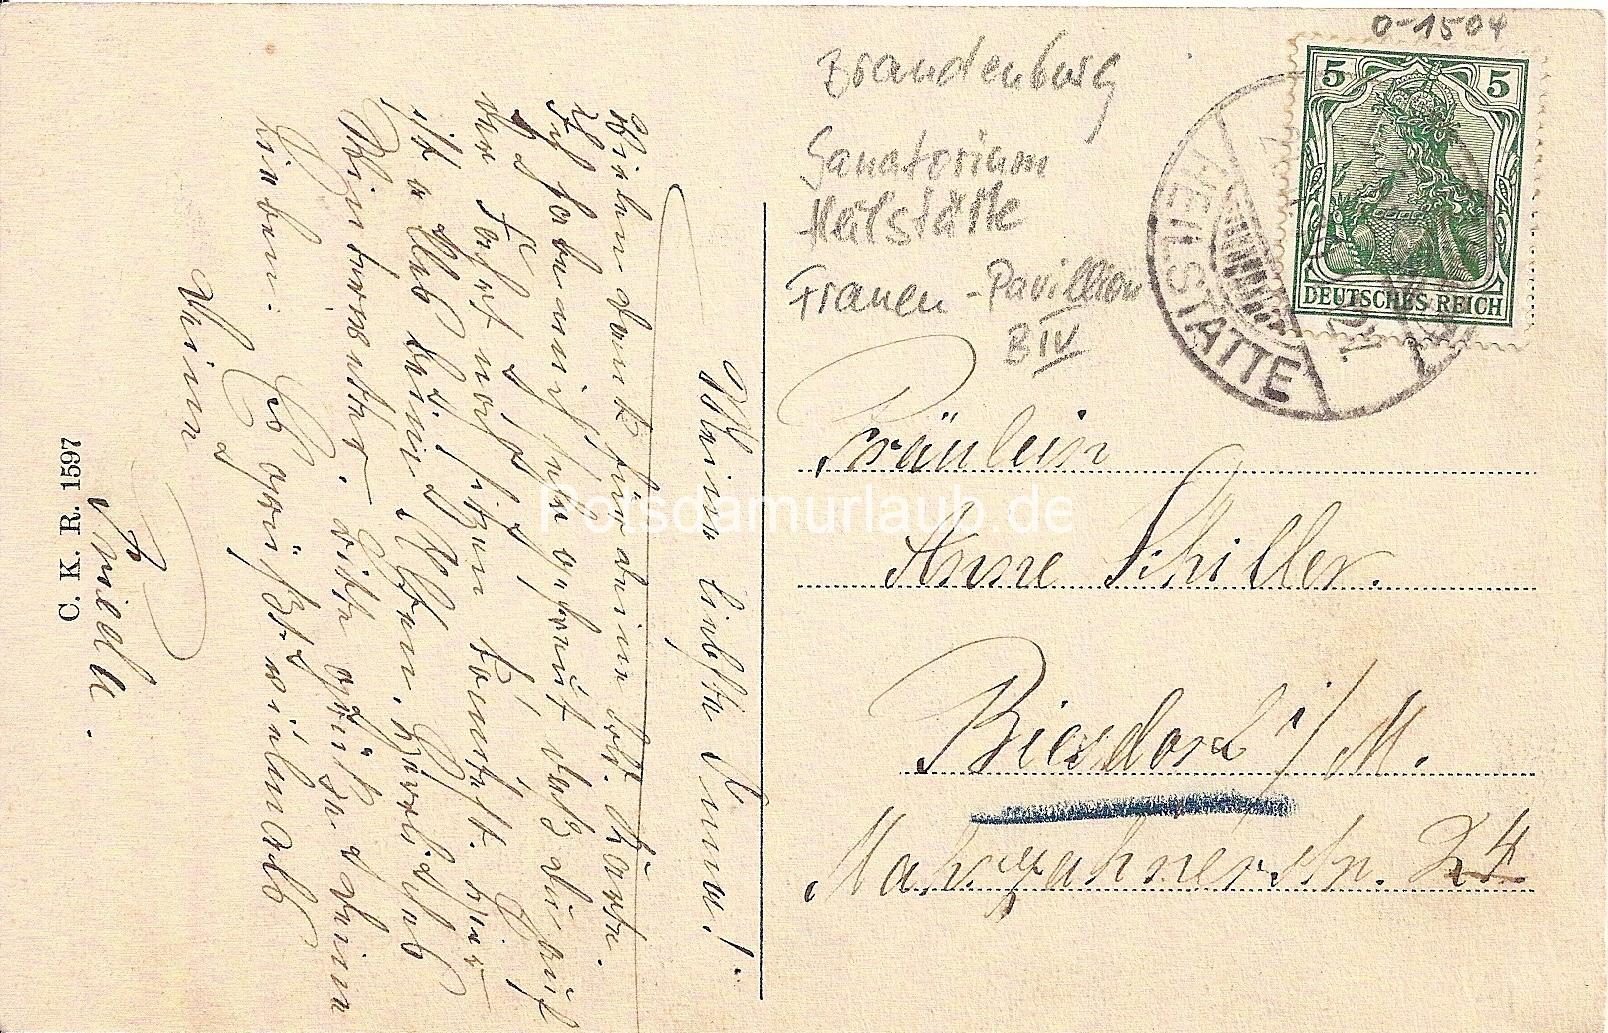 1910 11 25